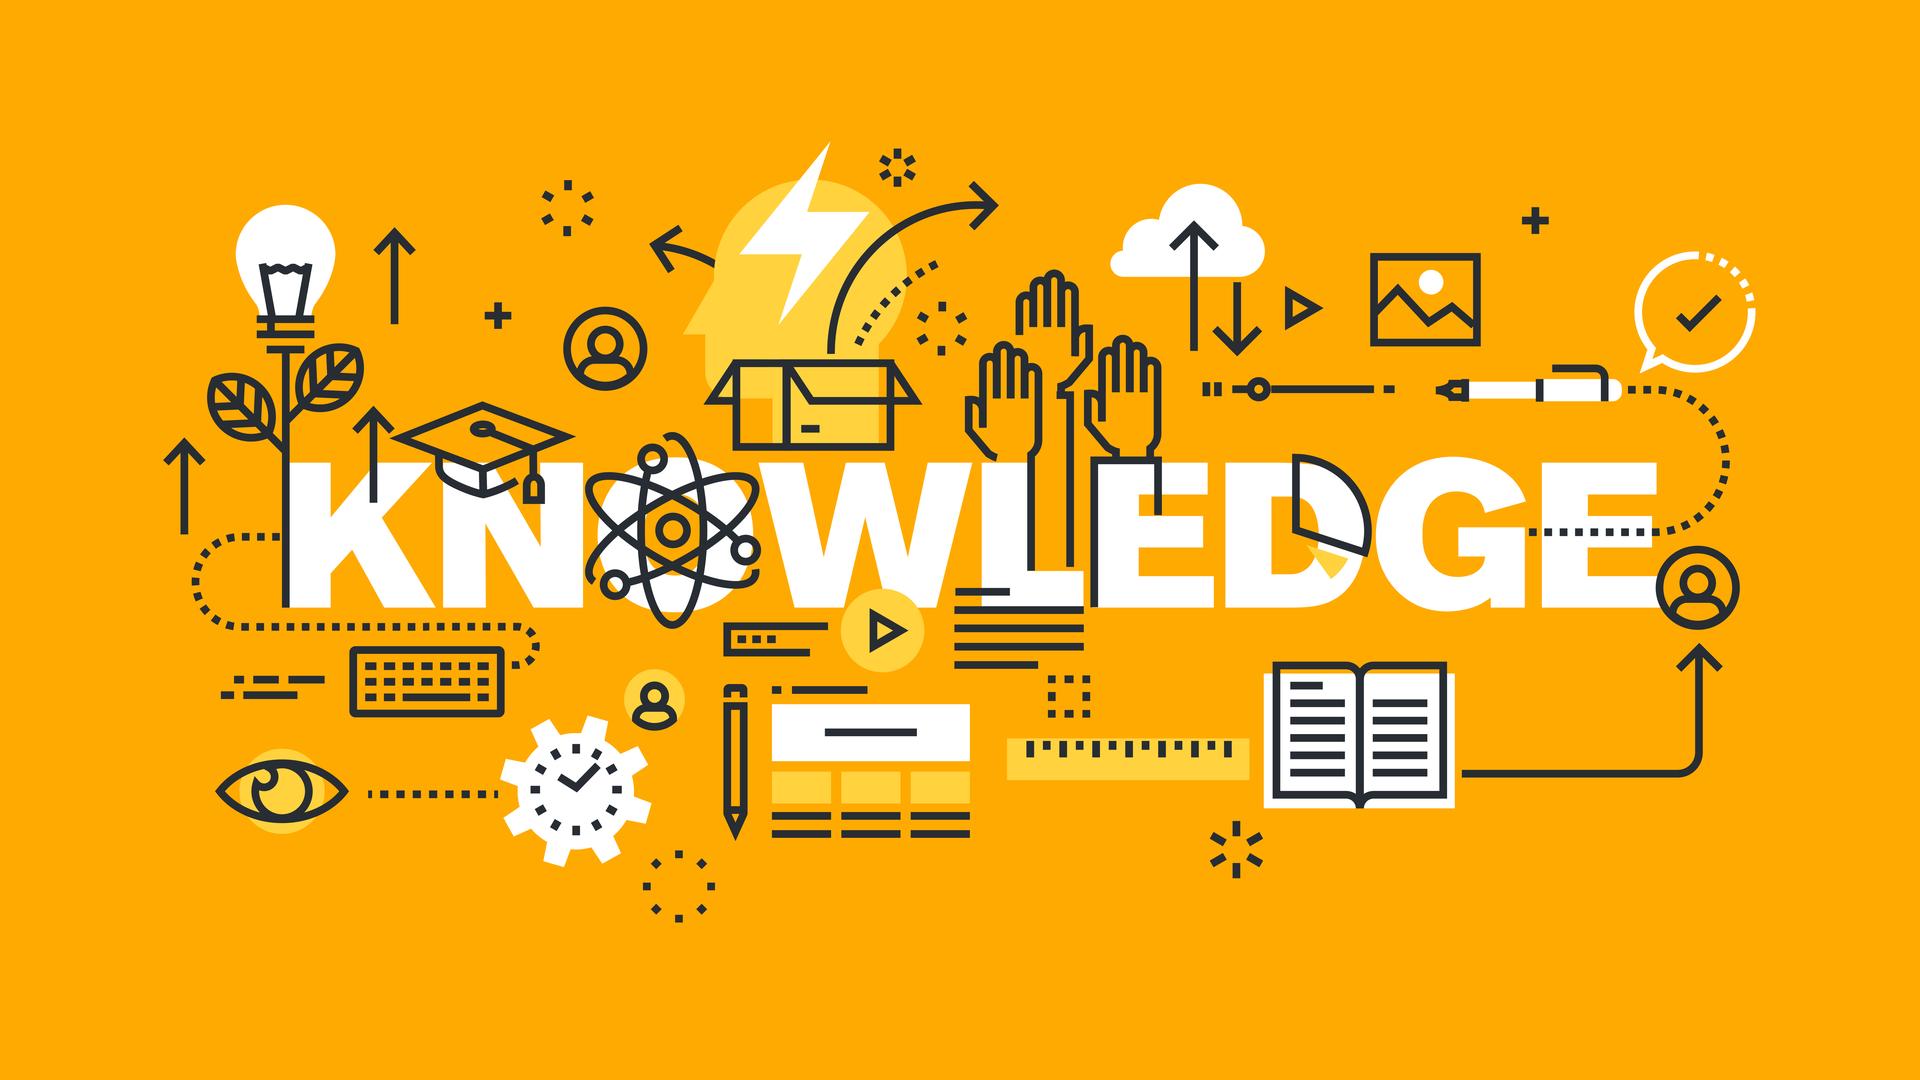 7 quick tips to improve knowledge management - Saffron Interactive